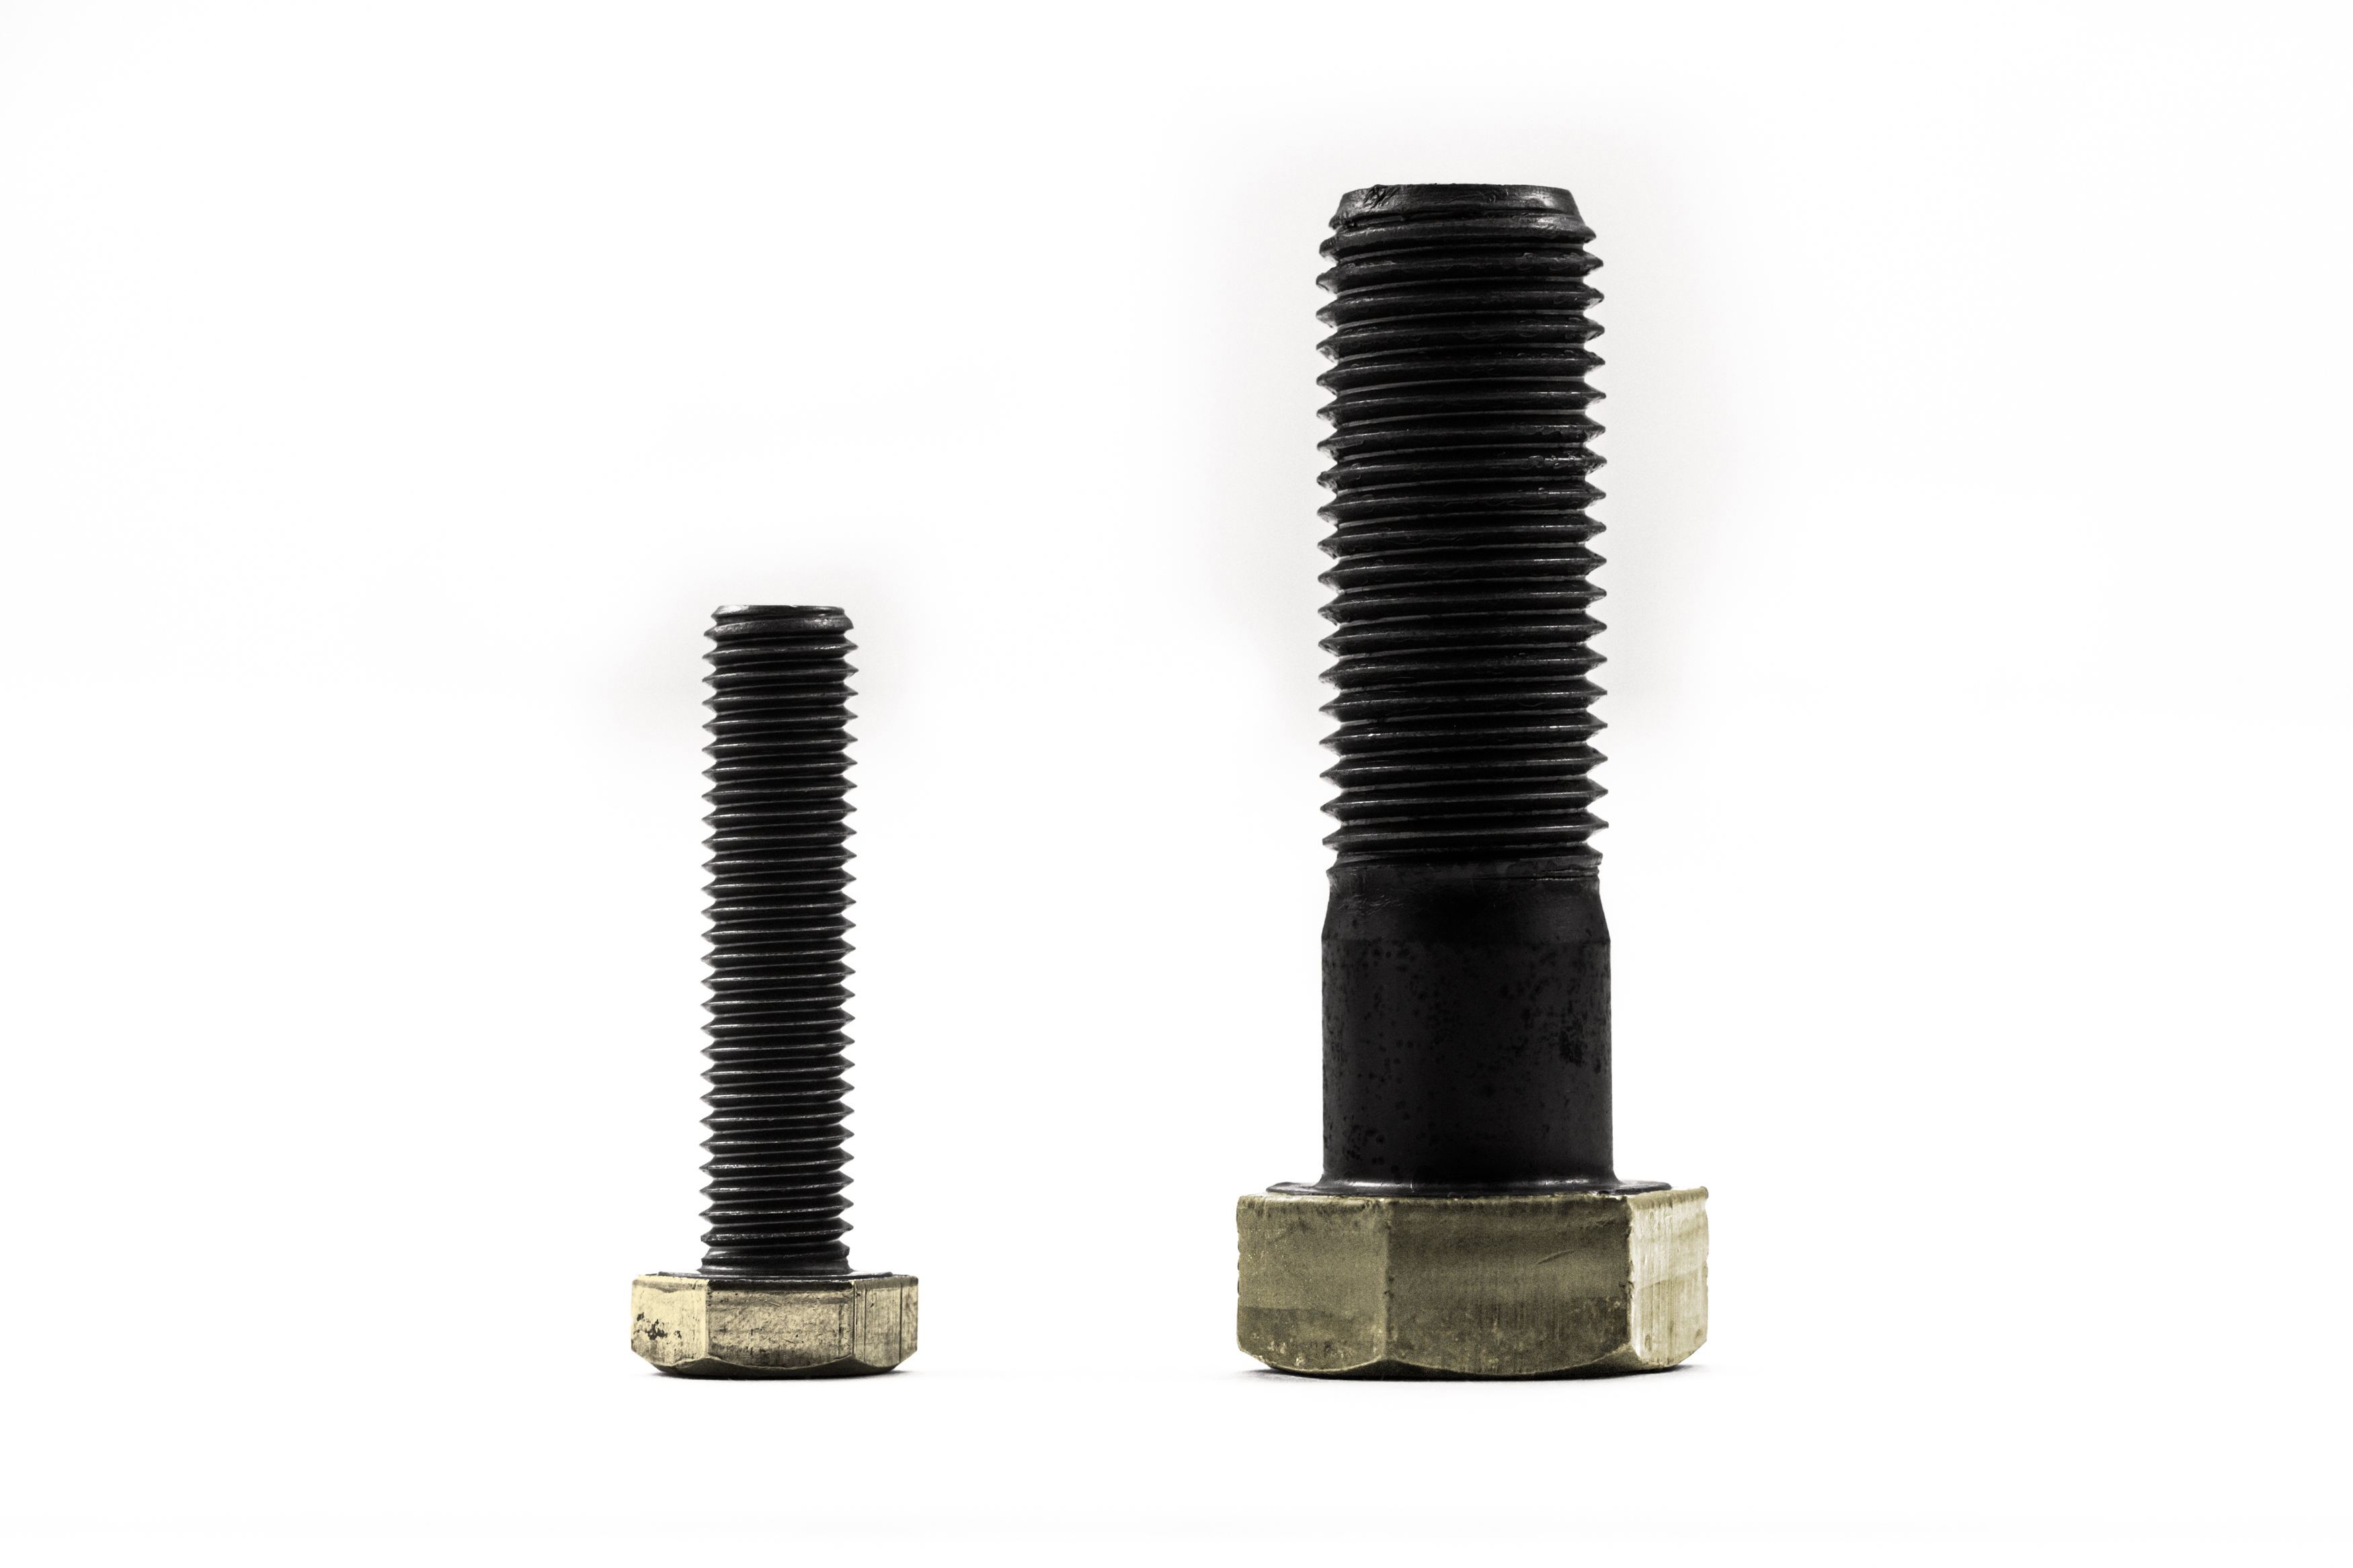 Graphene coating on screw